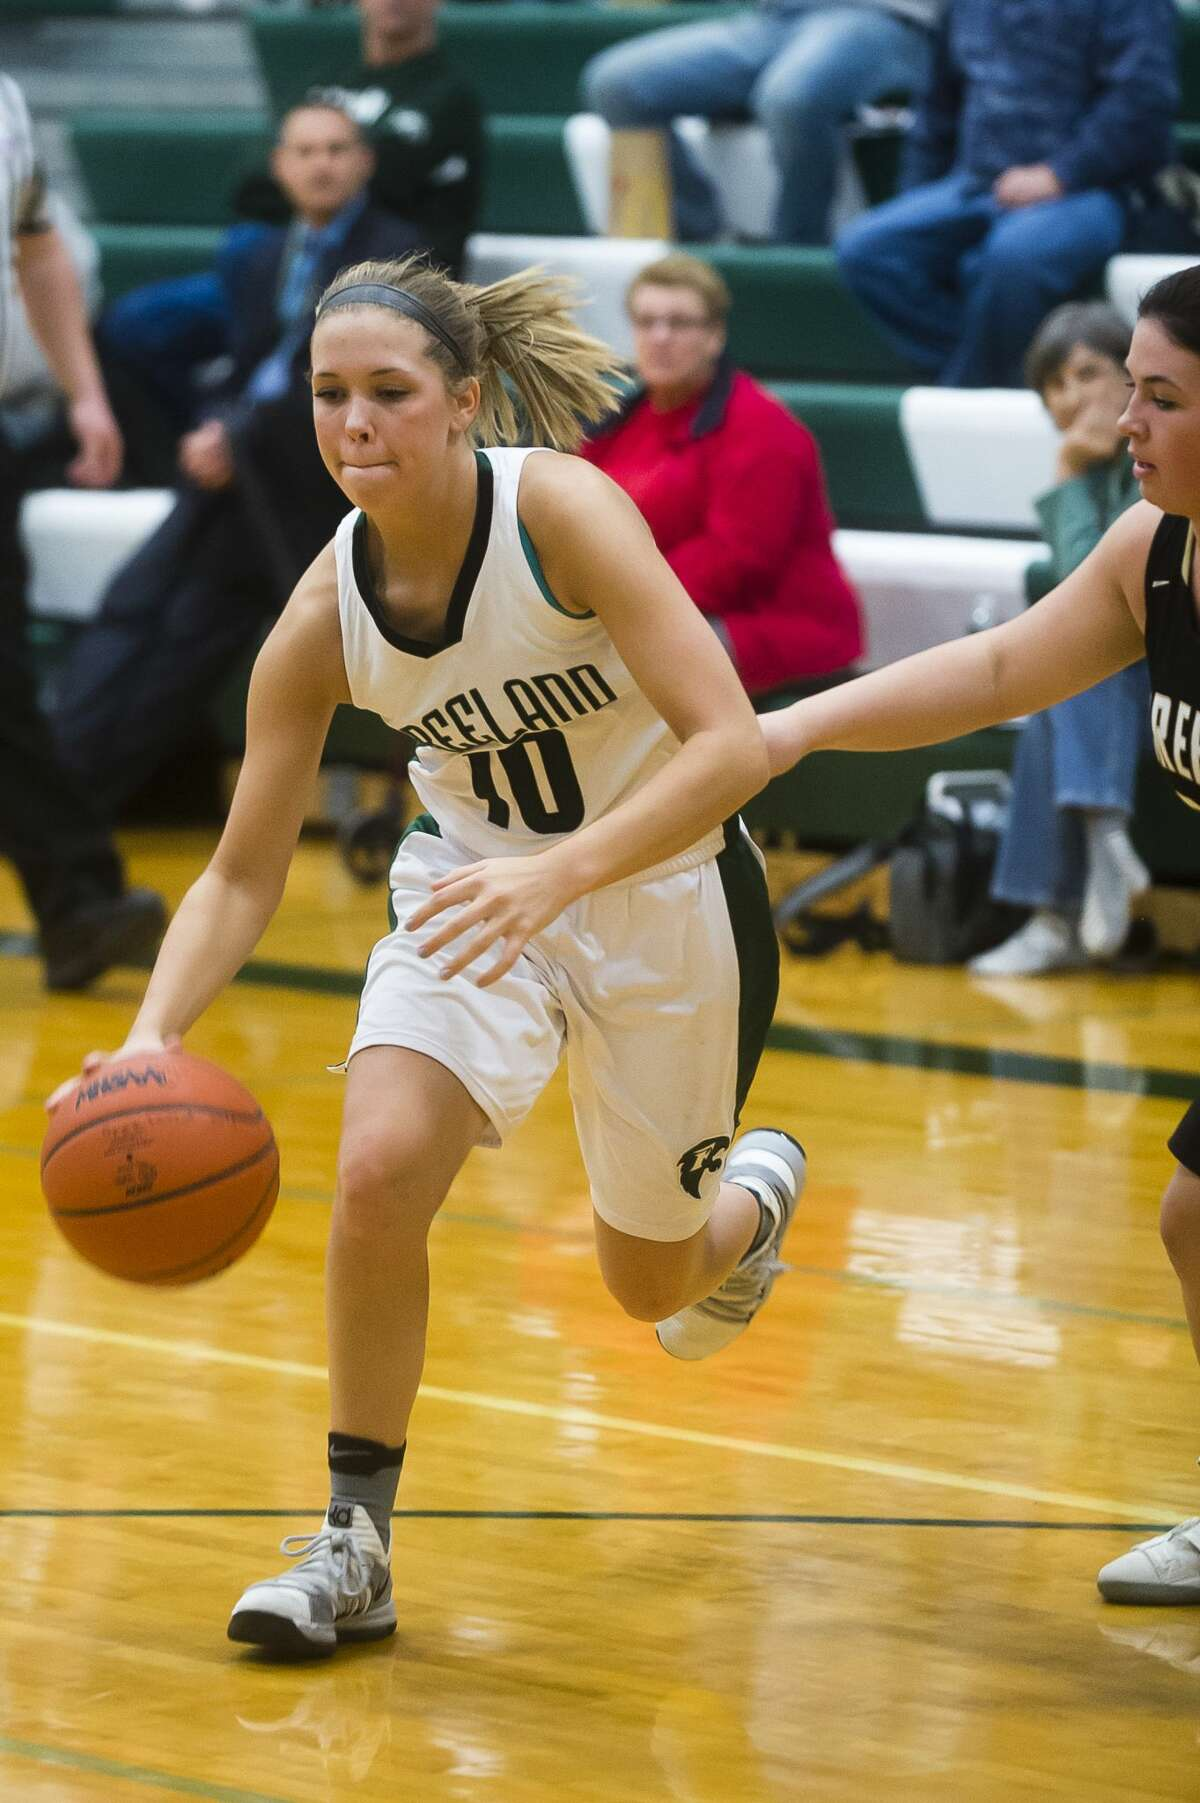 Freeland junior Lily Beyer dribbles toward the basket as Bullock Creek senior Breanna Mieske guards her during their game on Monday, Feb. 26, 2018 at Freeland High School. (Katy Kildee/kkildee@mdn.net)